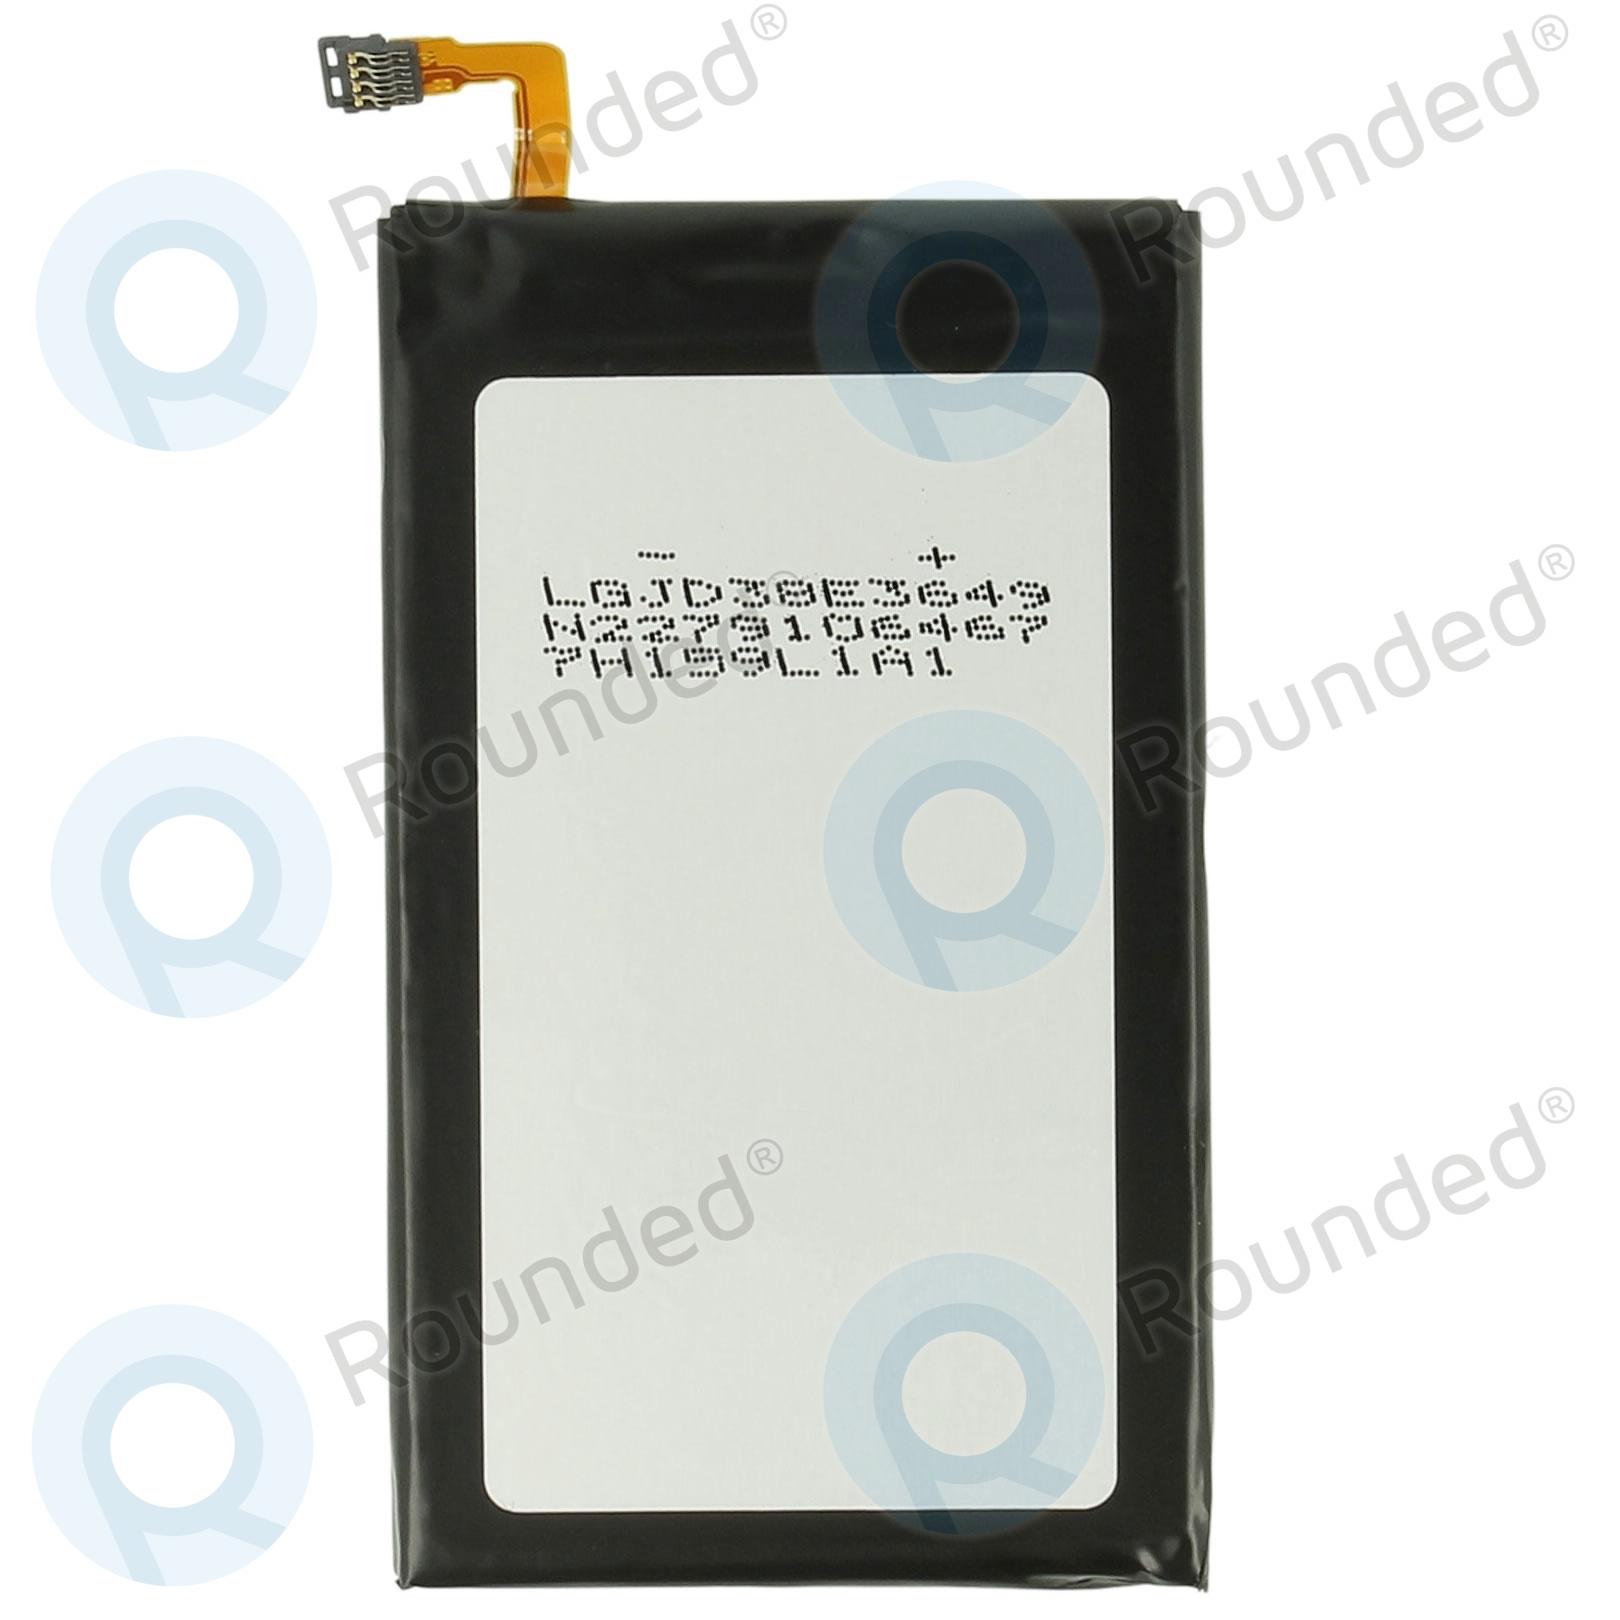 Motorola Moto G (2014), Moto G2 (XT1068), Moto G (2nd Gen) , Moto G 4G, Moto G LTE Battery ED30 2010mAh SNN5932A image-1